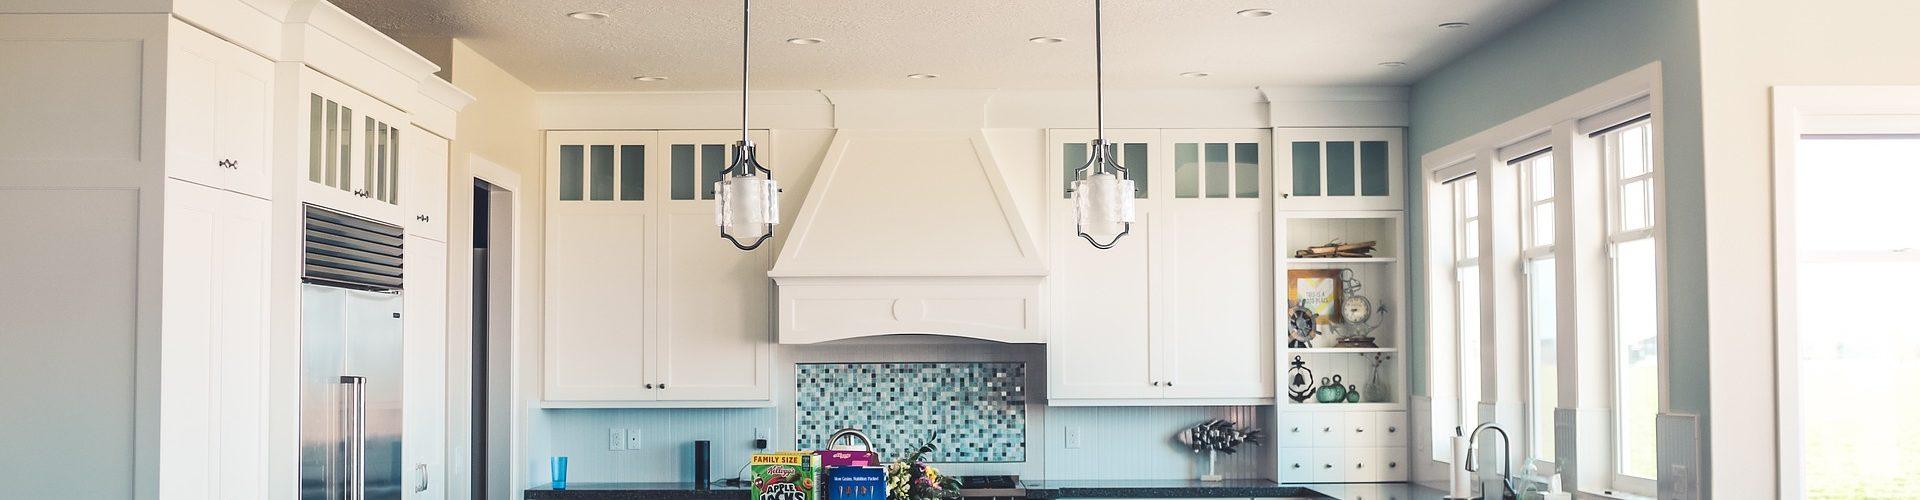 5 Interest Ideas For Classic Kitchens Diamond Kitchens